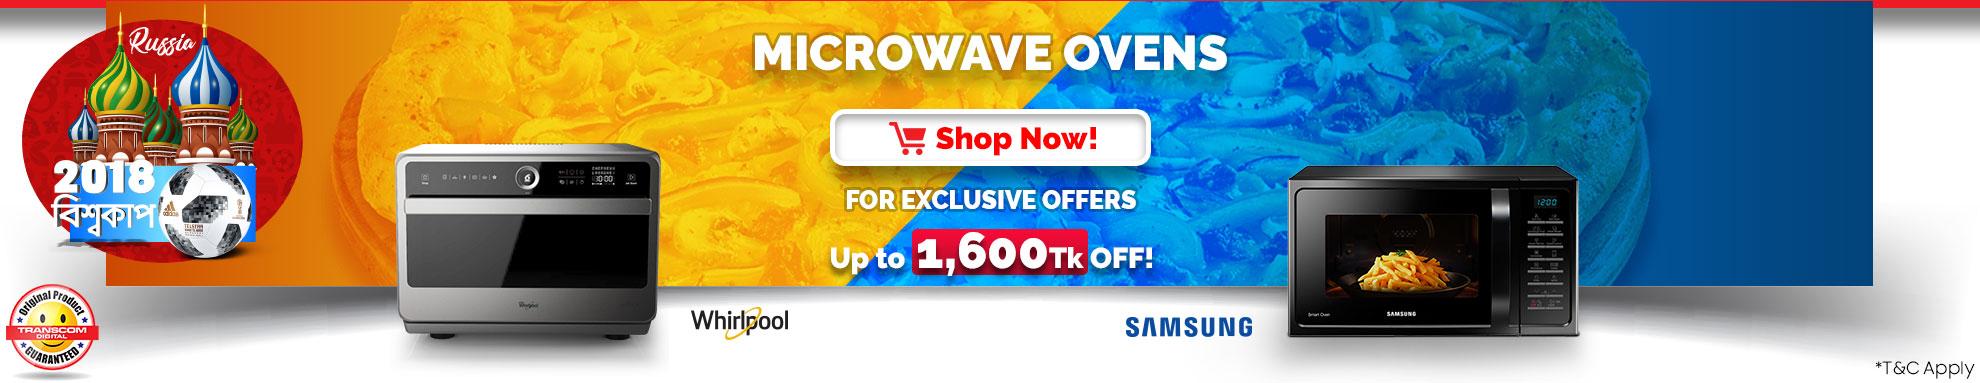 Microwave oven price, transcom digital bd